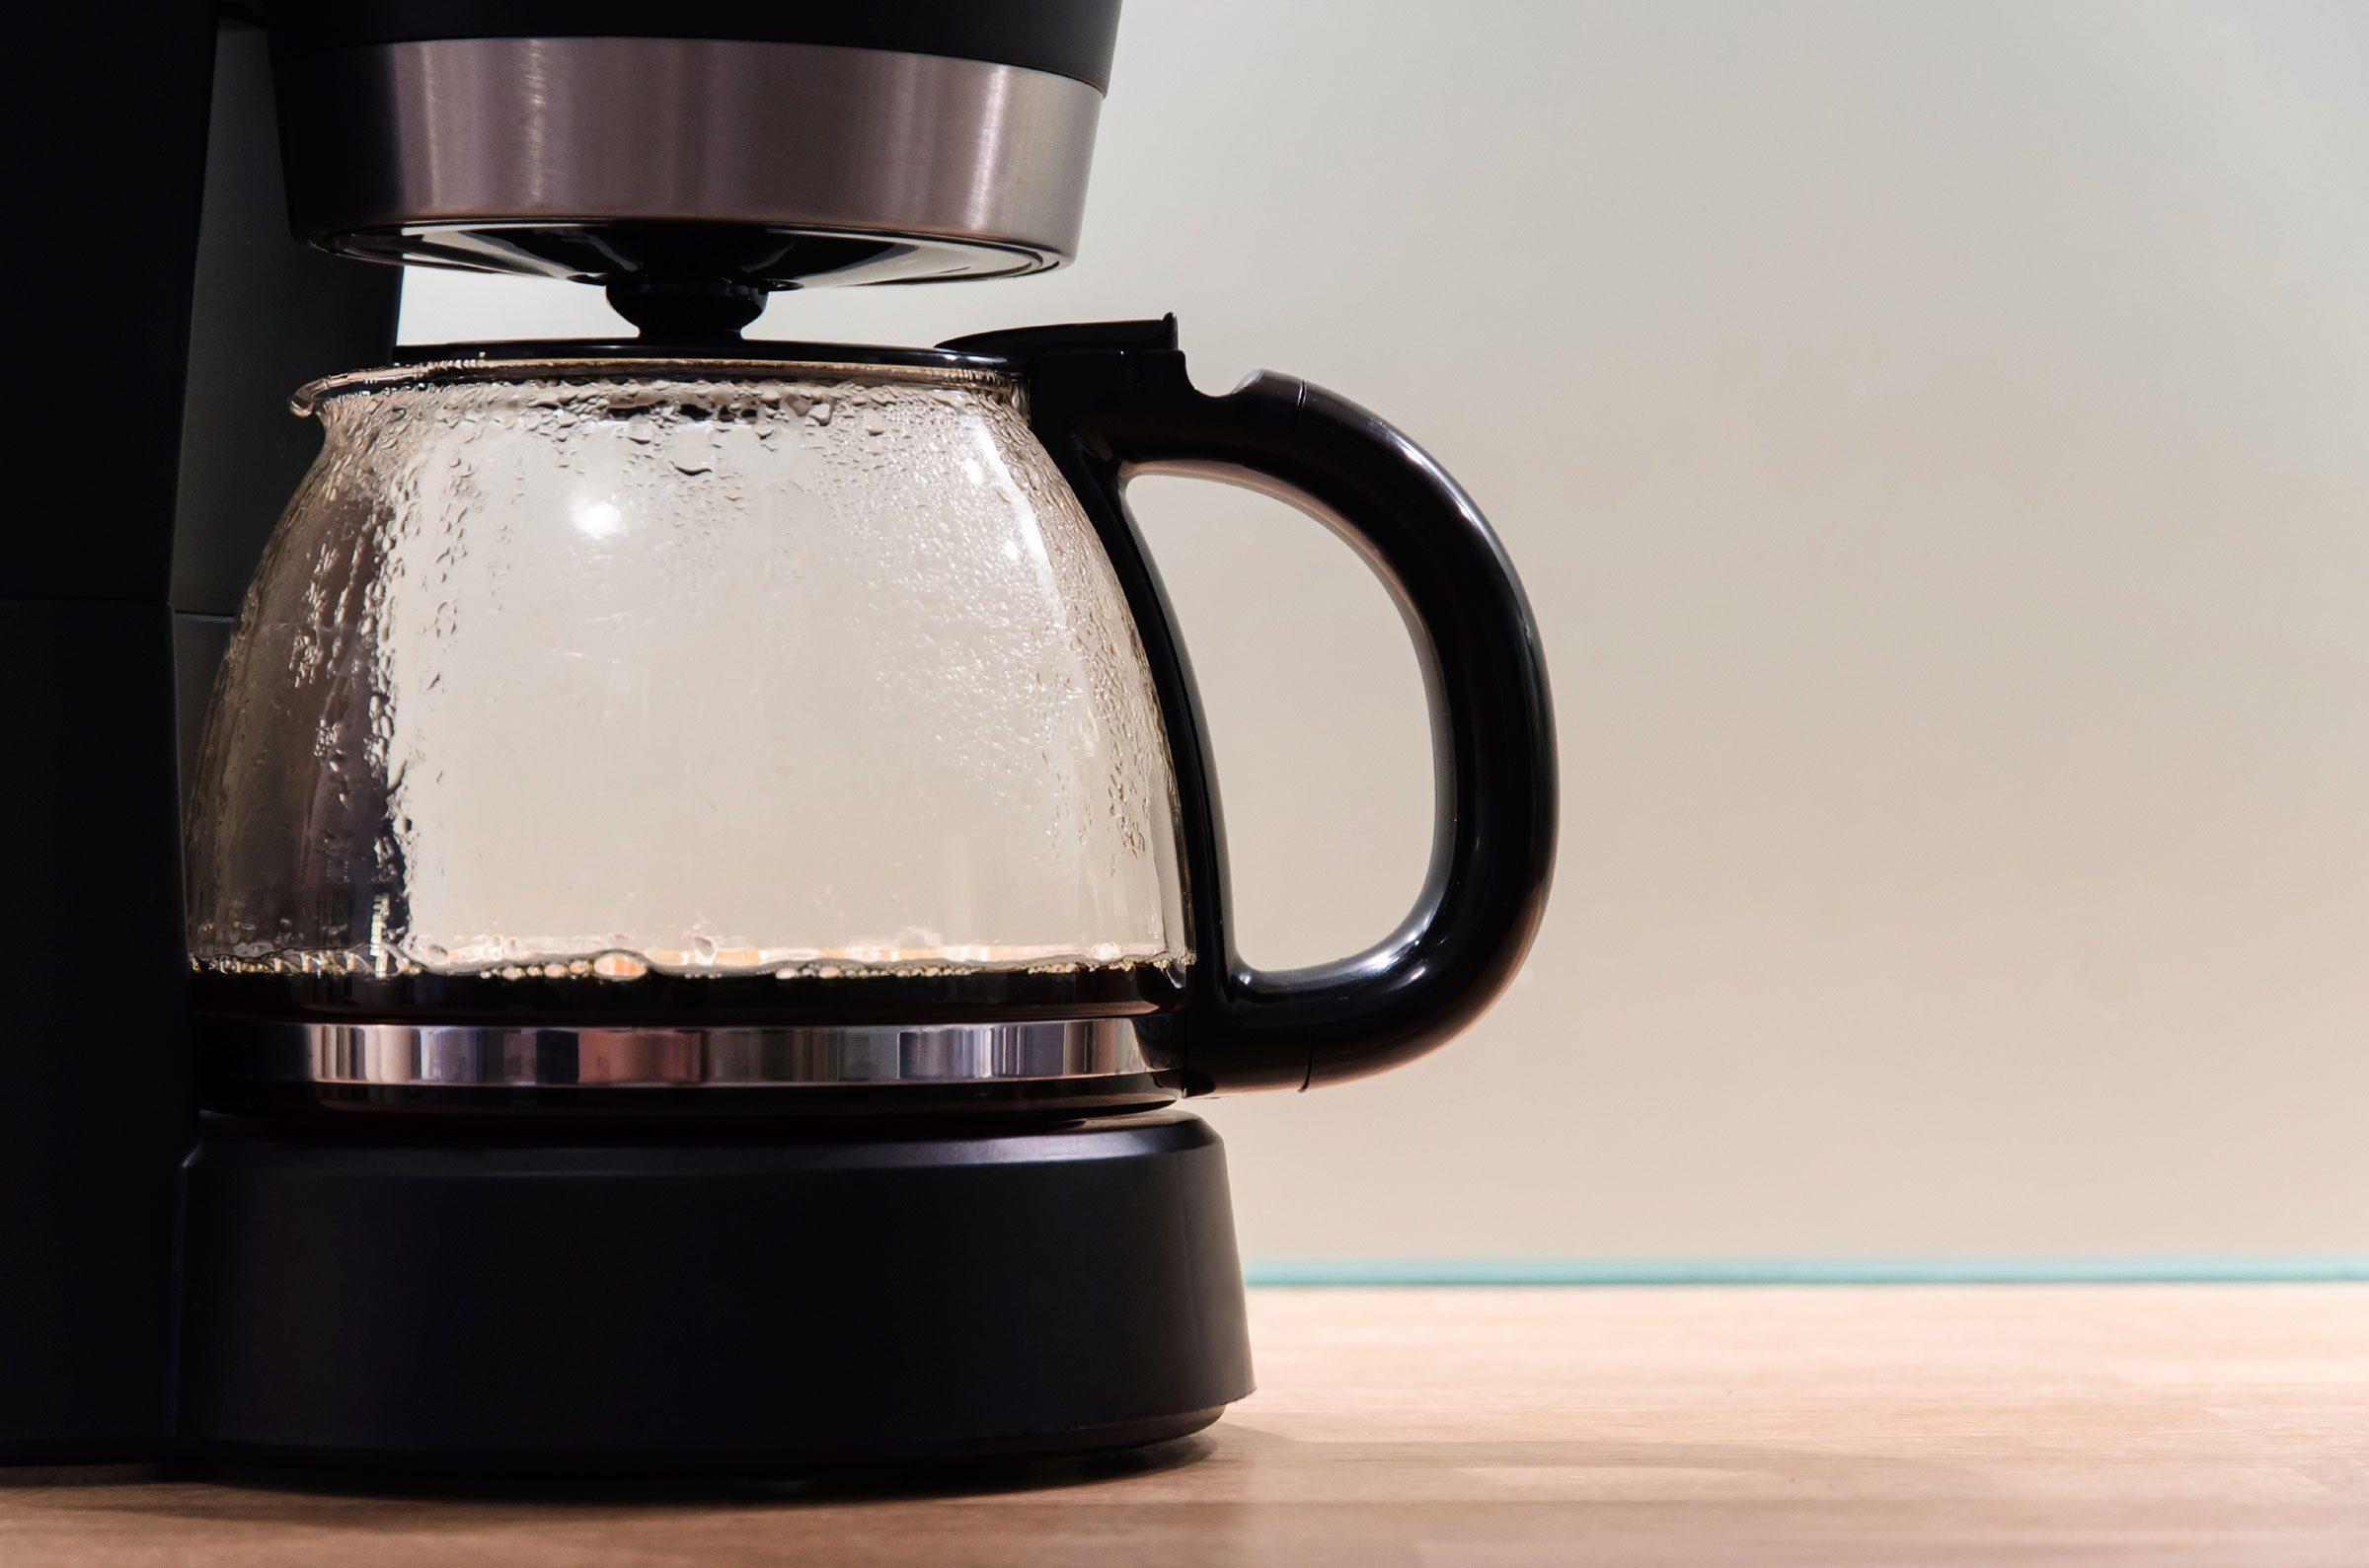 A Quick Coffee Pot Tip